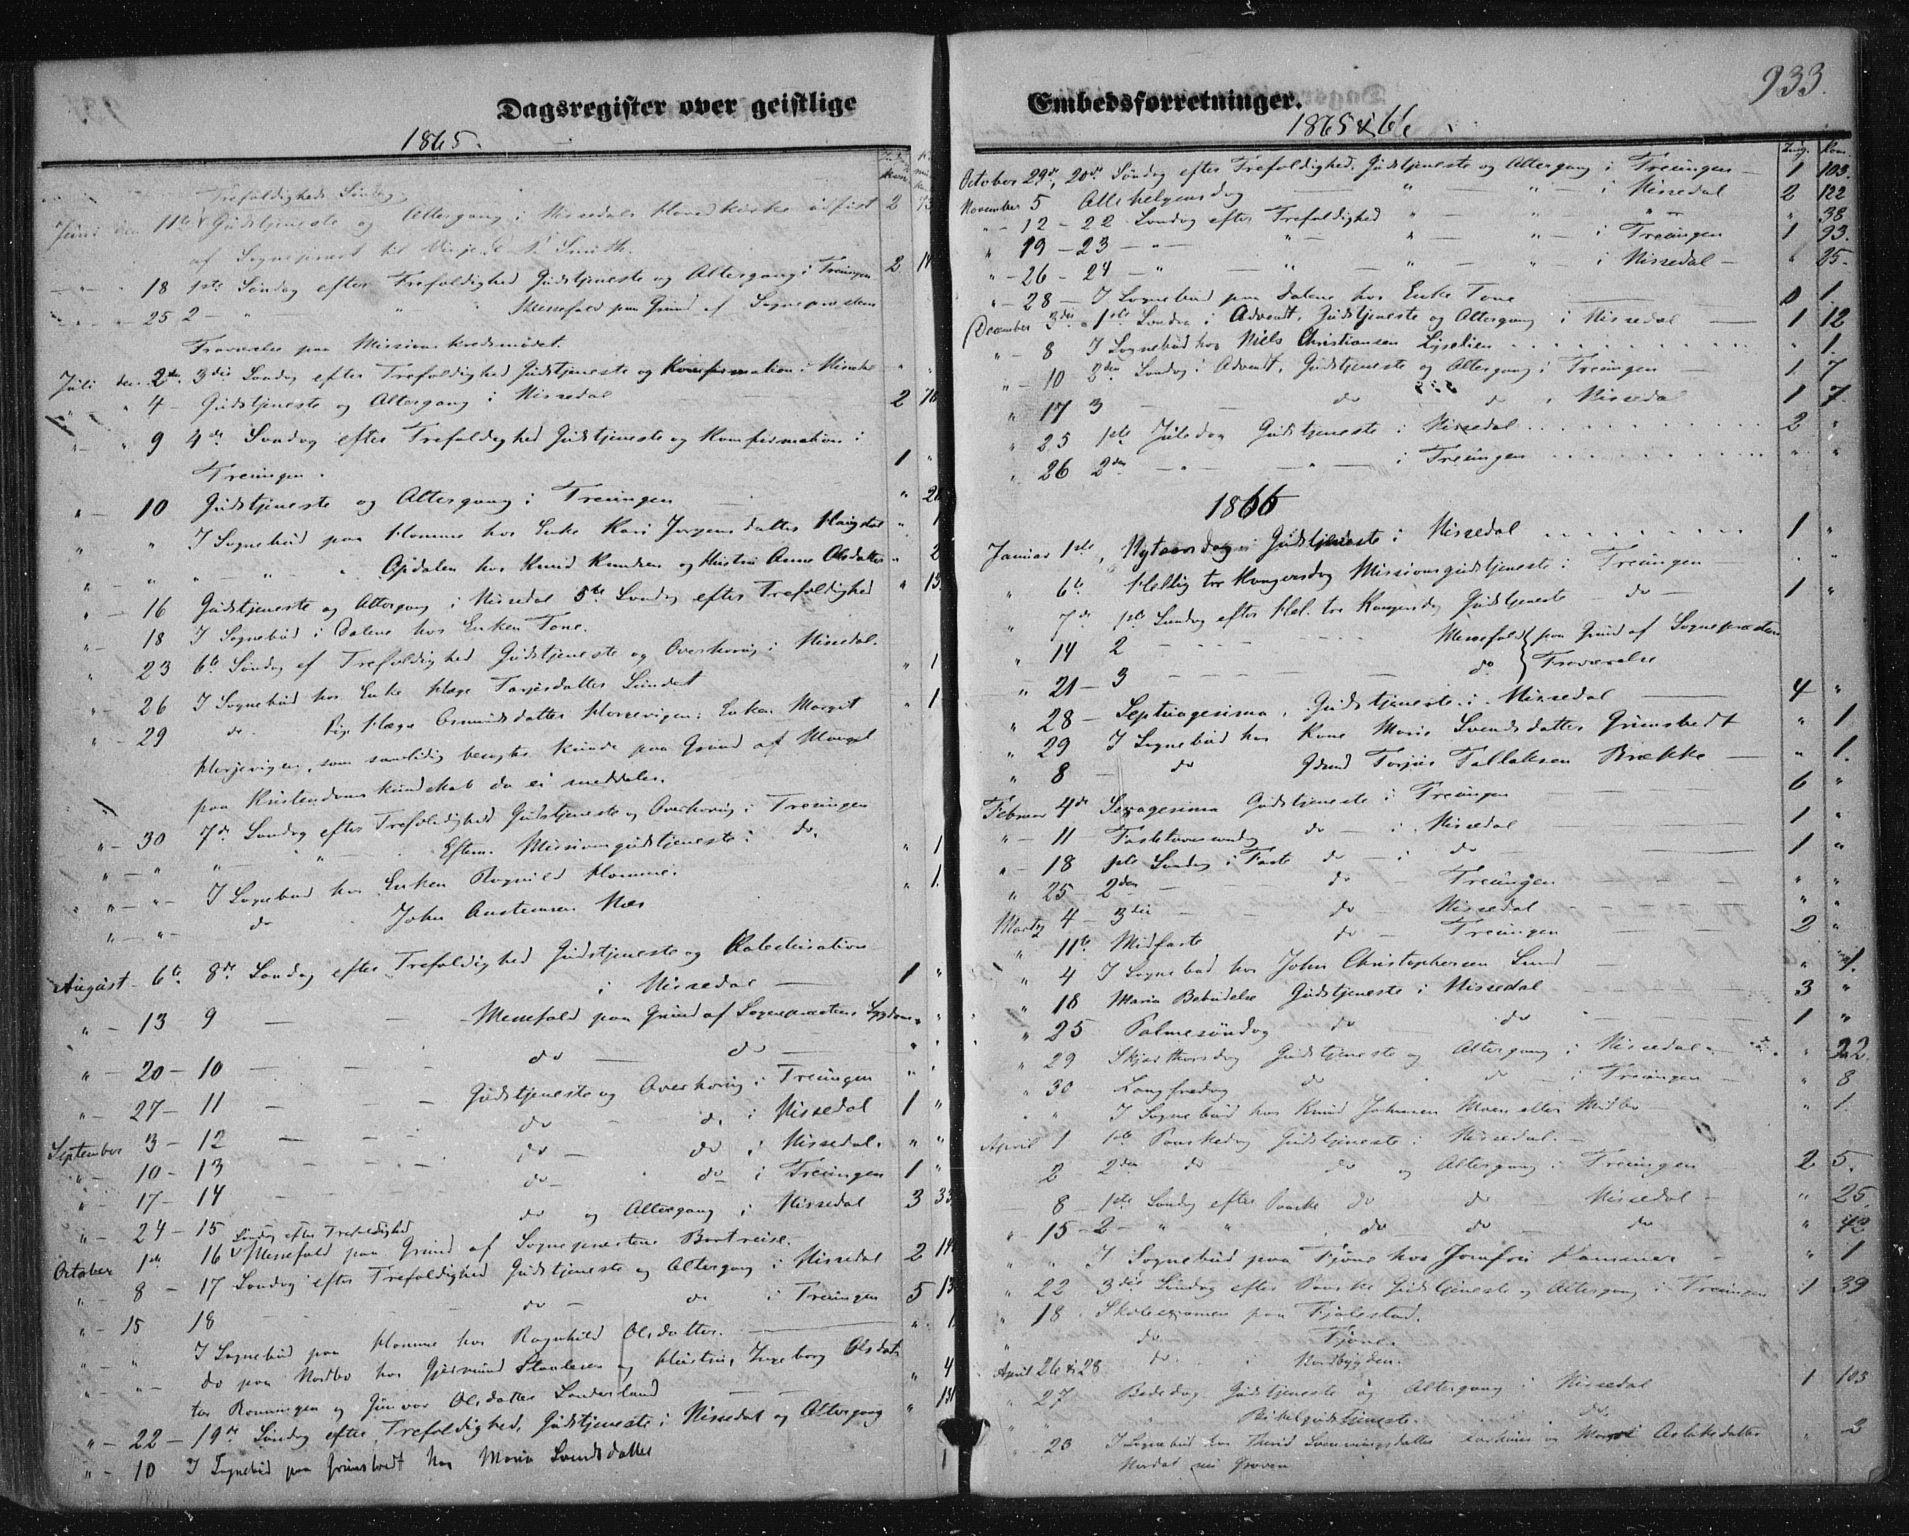 SAKO, Nissedal kirkebøker, F/Fa/L0003: Ministerialbok nr. I 3, 1846-1870, s. 932-933